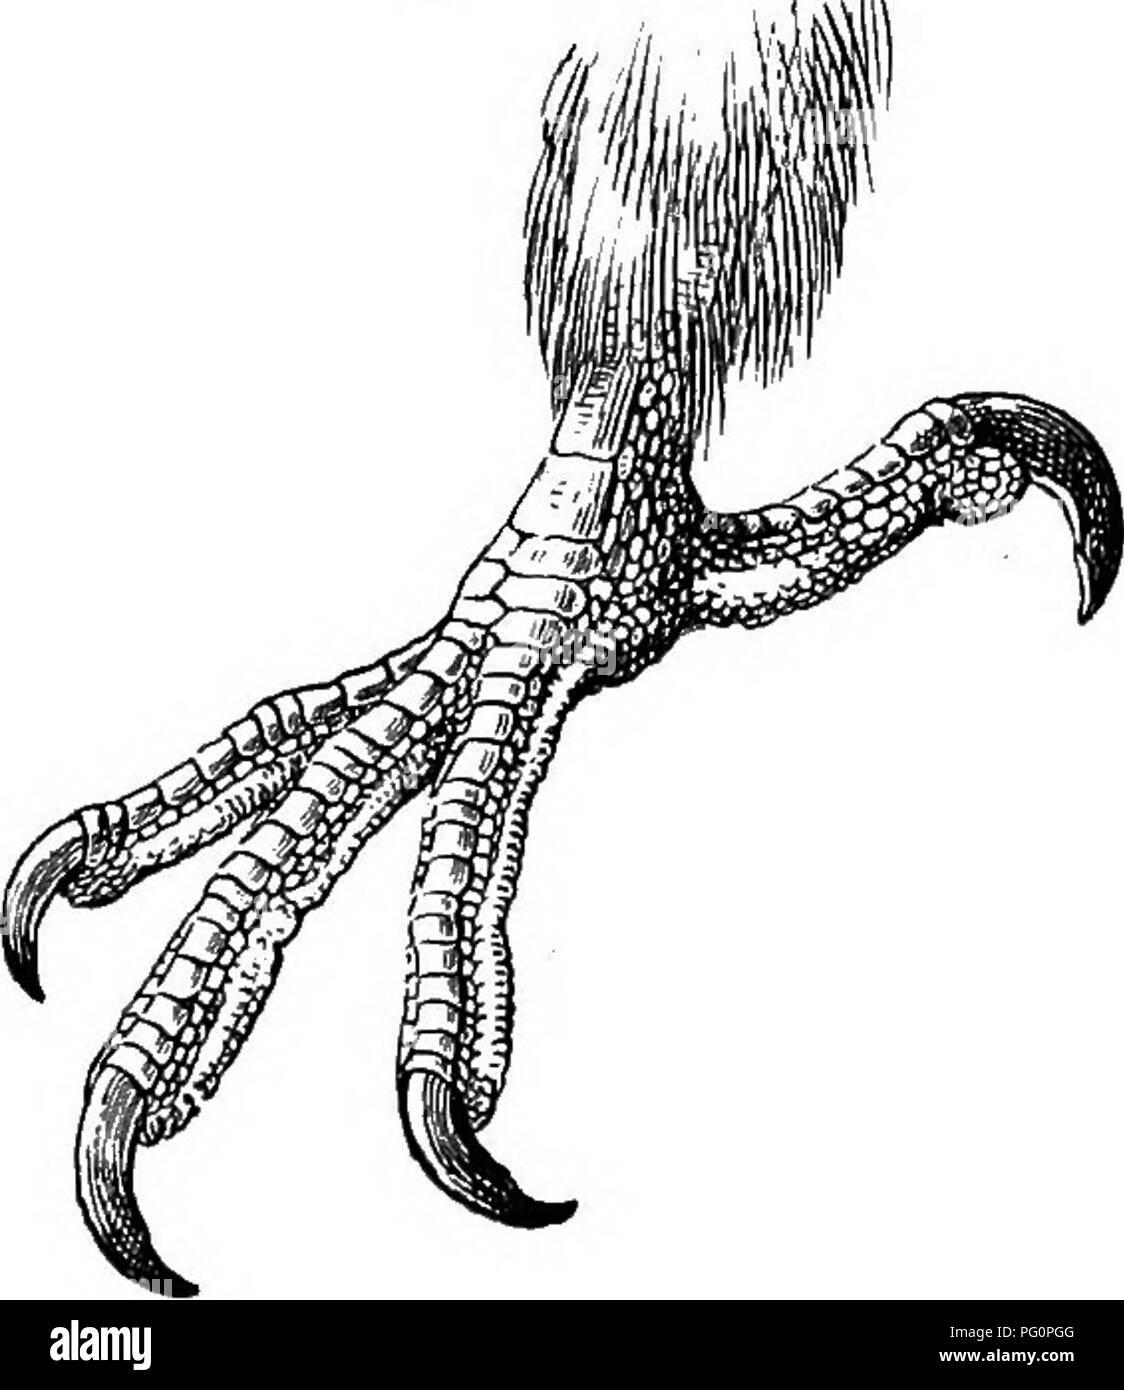 . The birds of South Africa. Birds. TEEKONID^ VINAOO 157 Key of the Species. A. Below greenish with an oKve tinge V. delalandii, p. 157. B. Below greenish with a yellowish tinge V. sehaloivi,-p. 159.. Fig. 48.—Left foot of Vinago delalandii. x  629. yinago delalandii. Delalande's Green Pigeon. Phalacrotreron delalandii, B^j. Coiisp. Av. ii, p. 6 (1854); id. Icon Pig. pi. 1 (1857) ; Ayres, Ibis, 1880, p. 109. Treron delalandii, Gurney, Ibis, 1862, p. 33 ; Layaid, B. S. Afi: p. 255 (1867); Gurney, Ibis, 1868, p. 164; Shelley, Ibis, 1875, p. 83; Holub Sf- Peheln, Oni. Siid-Afr. p. 171 (1882); S - Stock Image